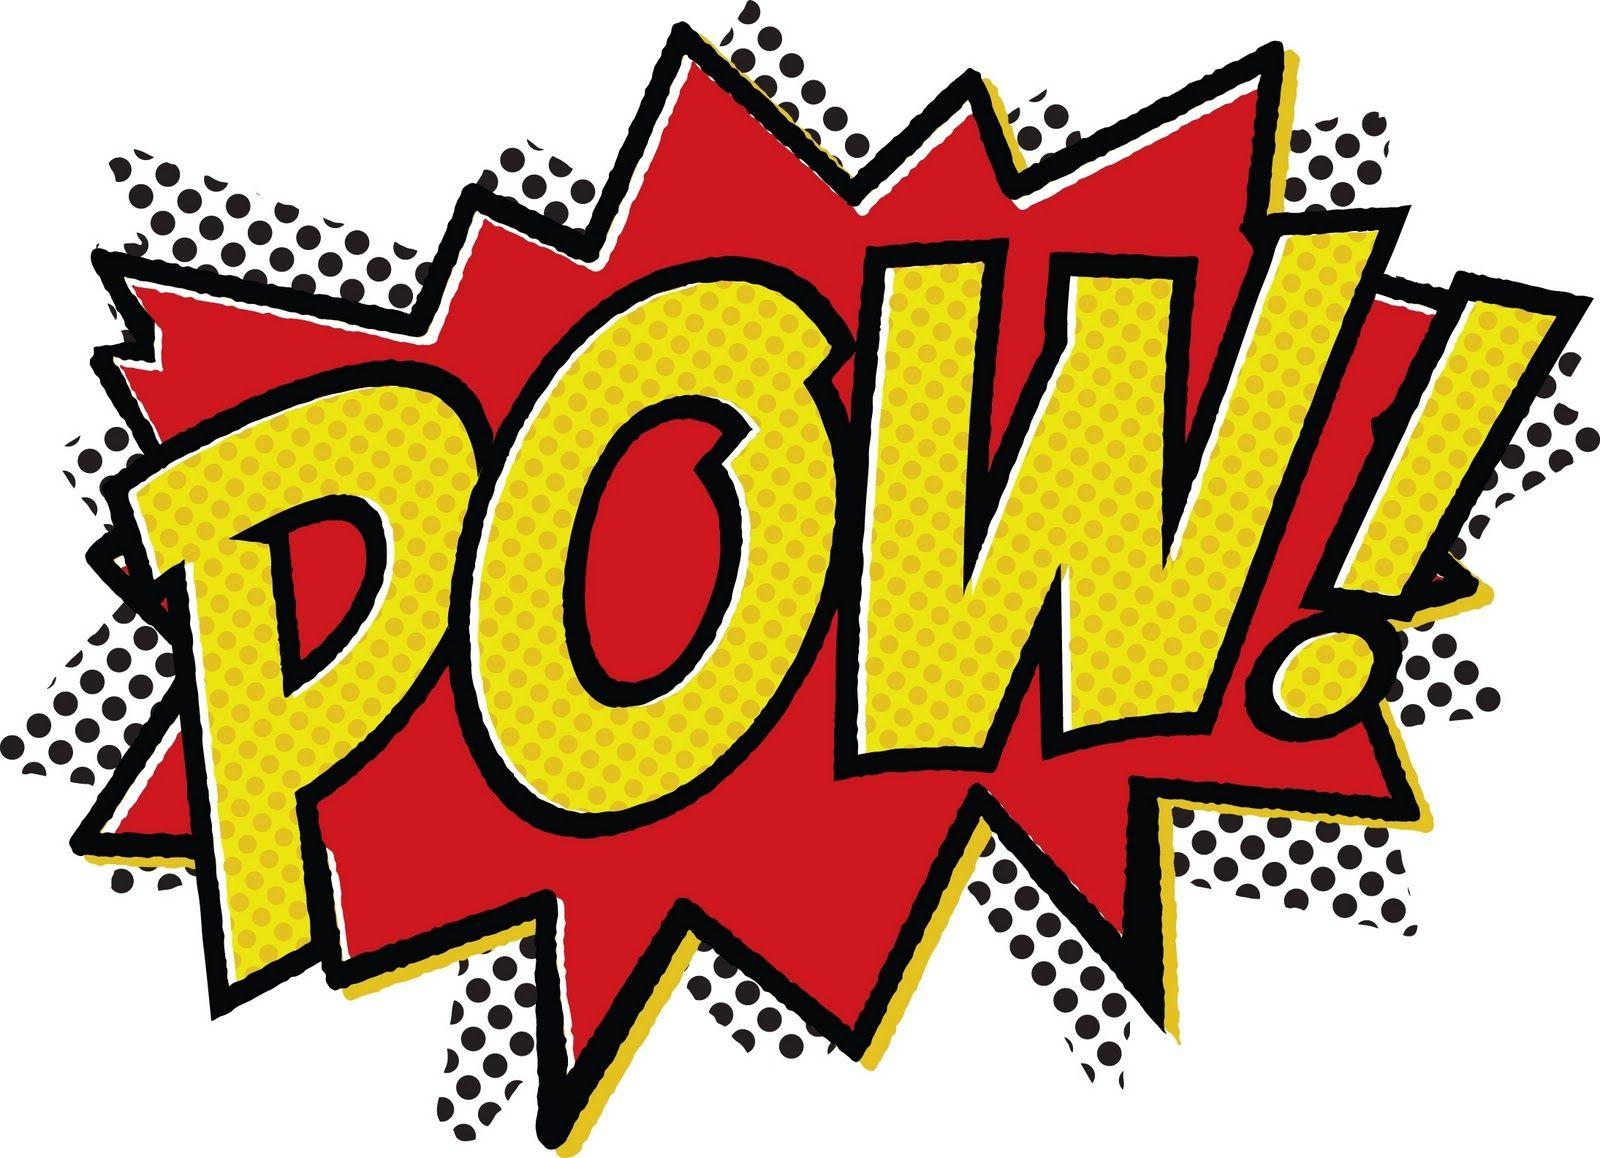 Superhero Printables | Printables | Pinterest | Superhero Cartoon - Free Printable Superhero Words